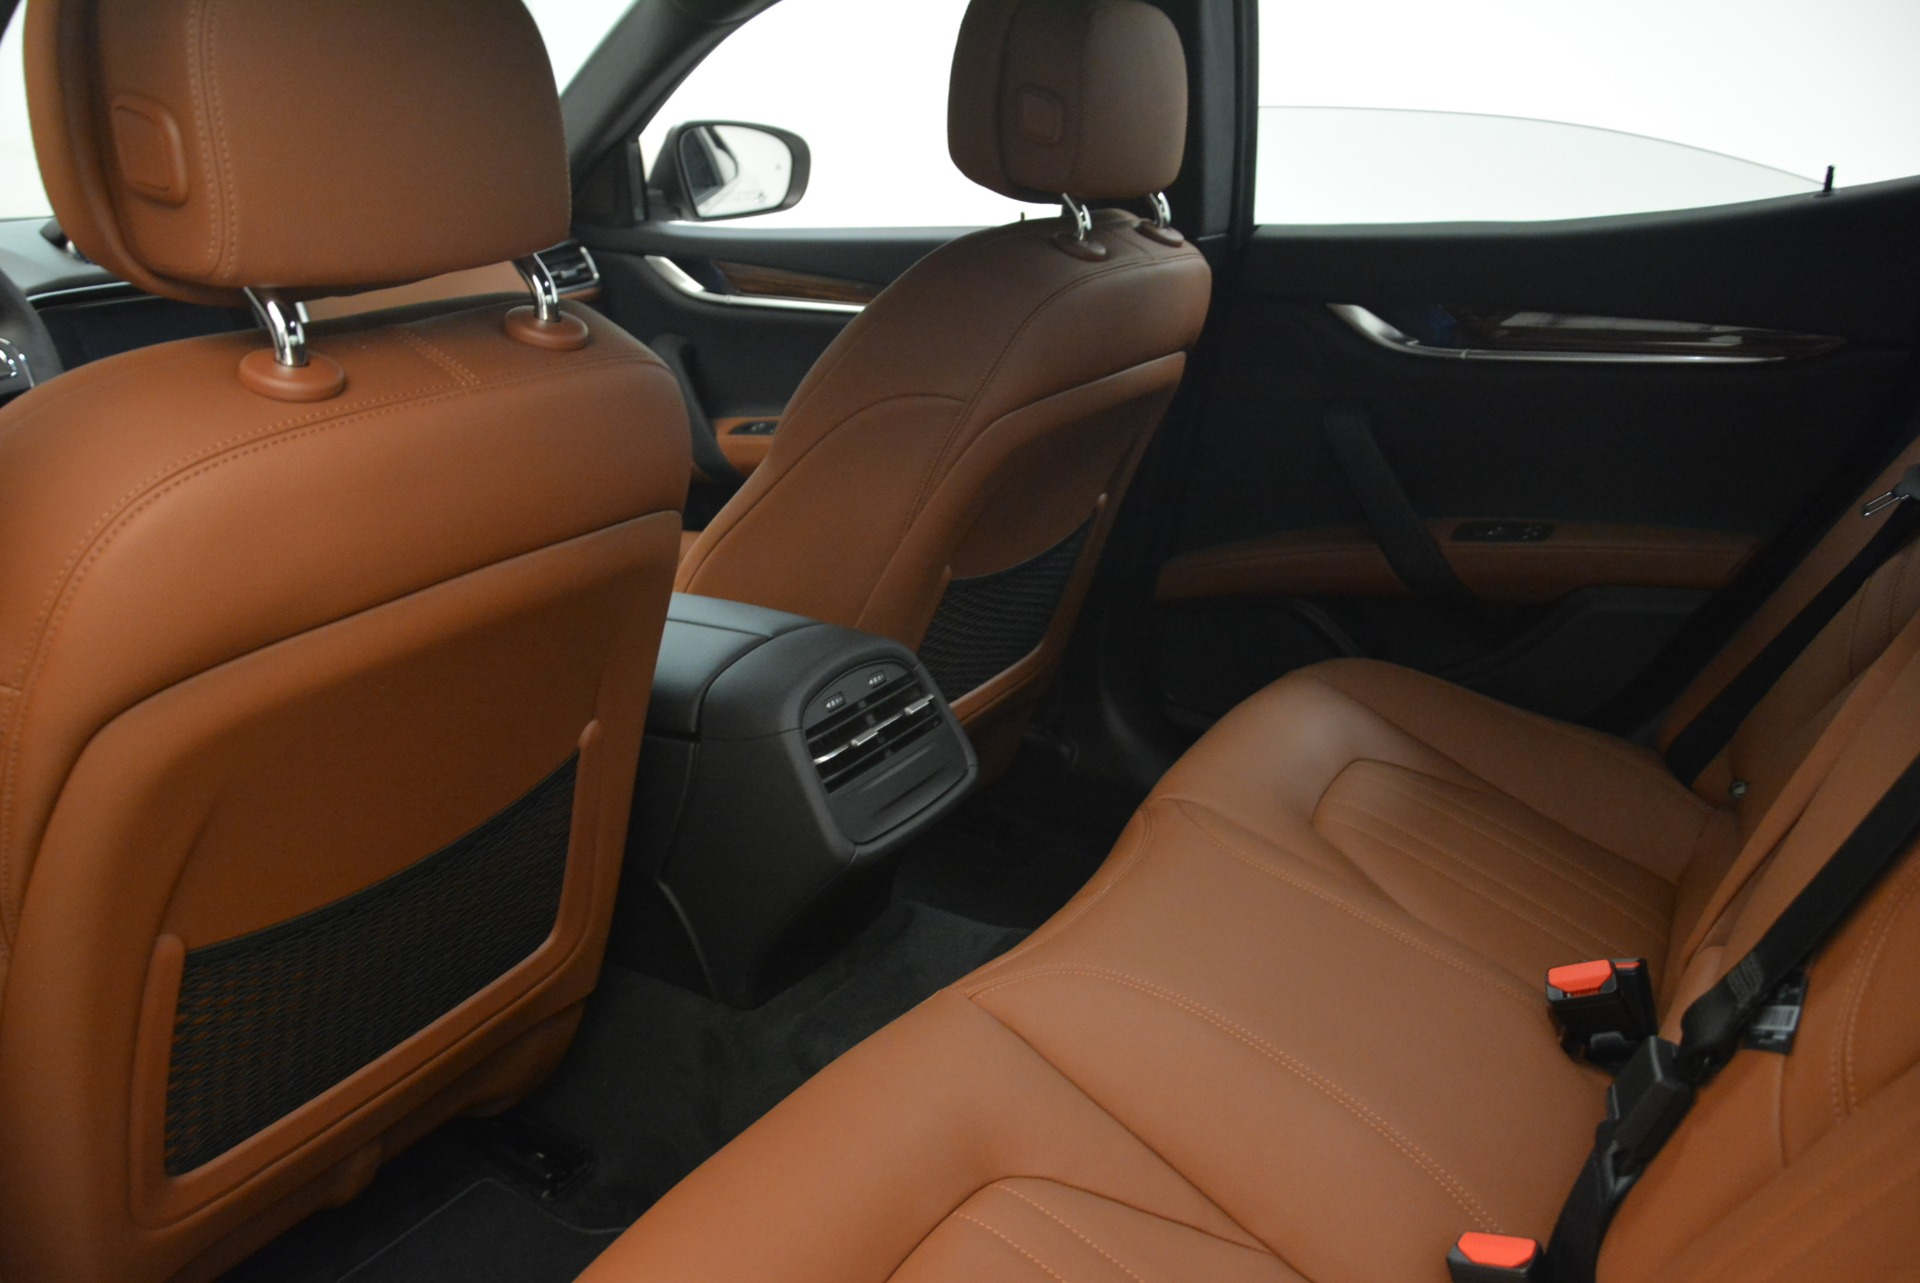 Used 2019 Maserati Ghibli S Q4 For Sale In Greenwich, CT 2739_p17